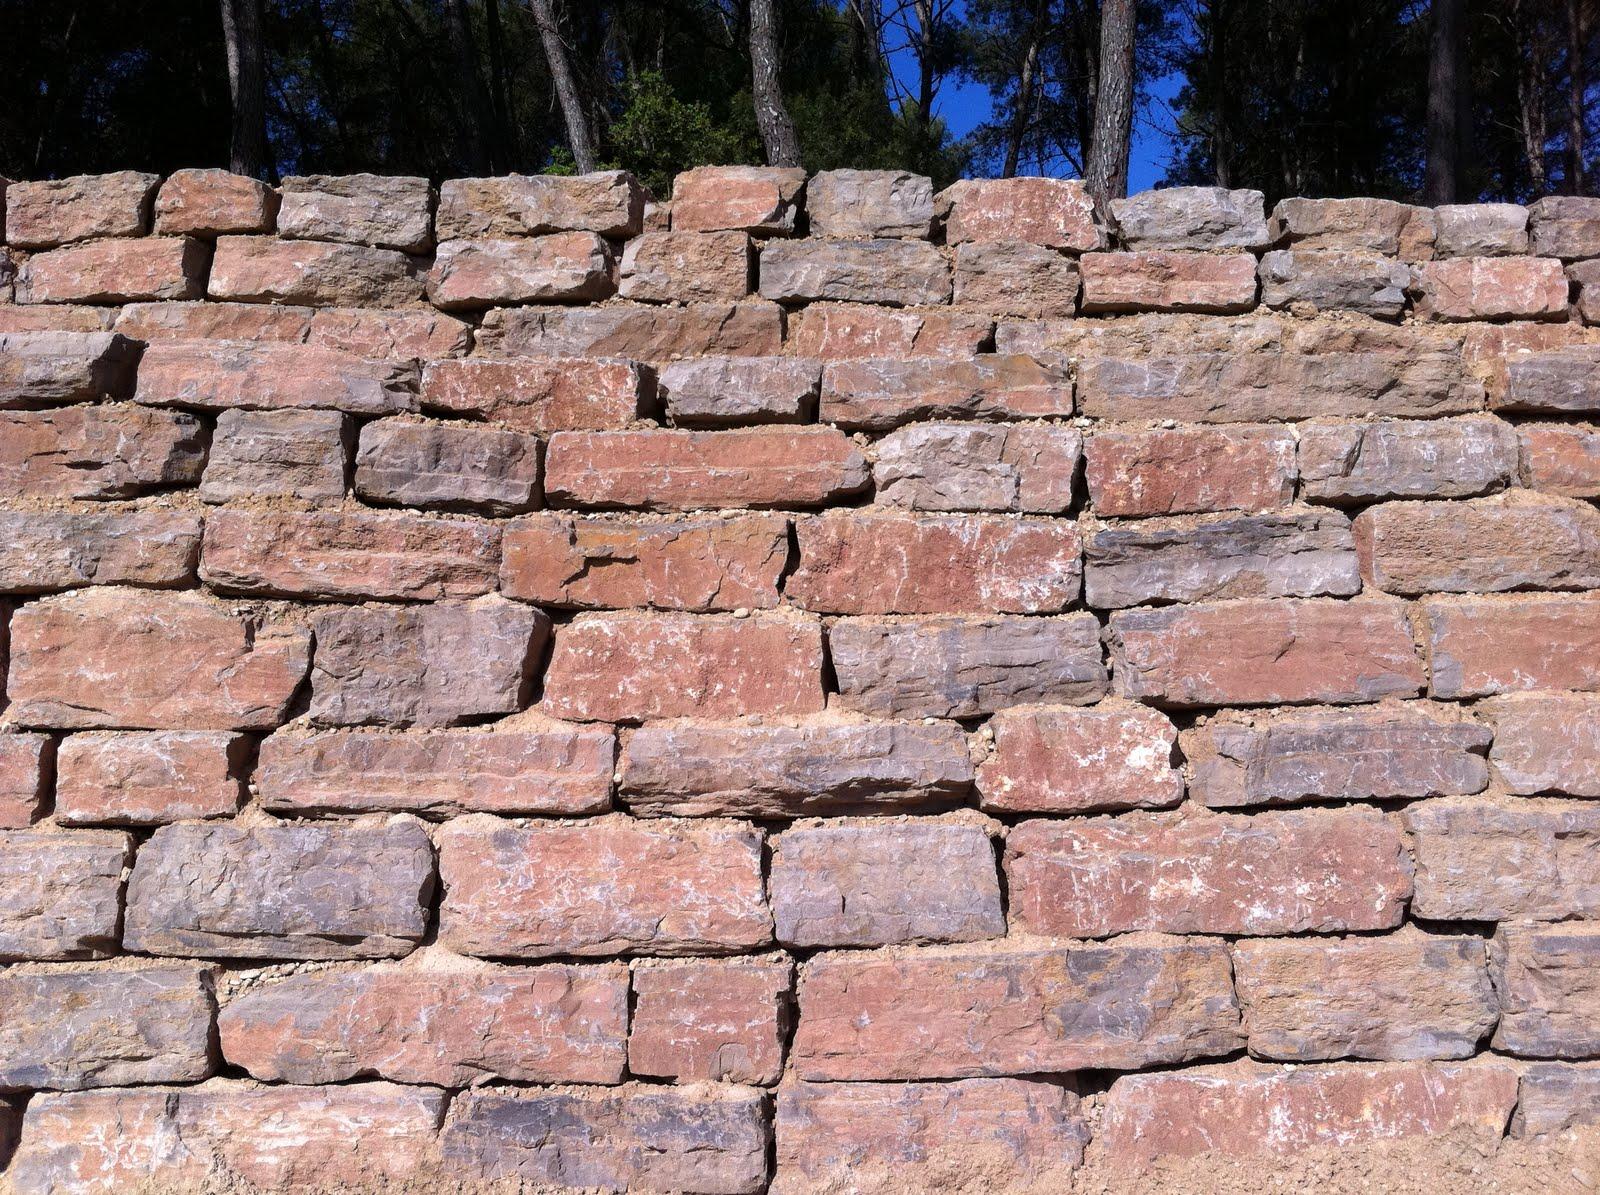 Muros de rocalla muros de rocalla - Muros de rocalla ...